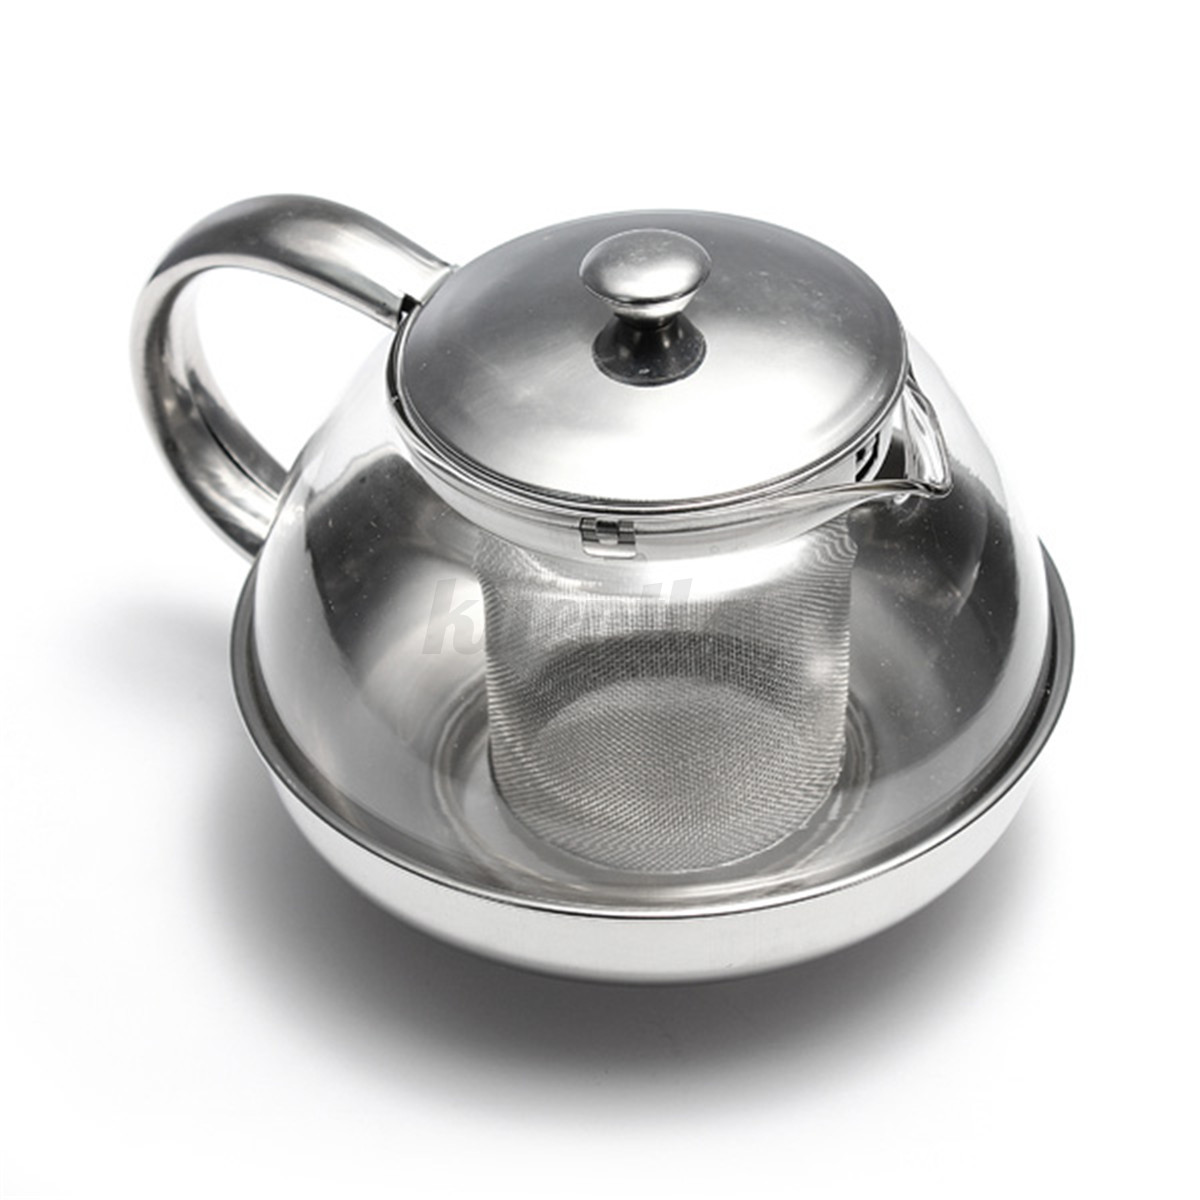 Stainless steel glass teapot tea pot herbal leaf